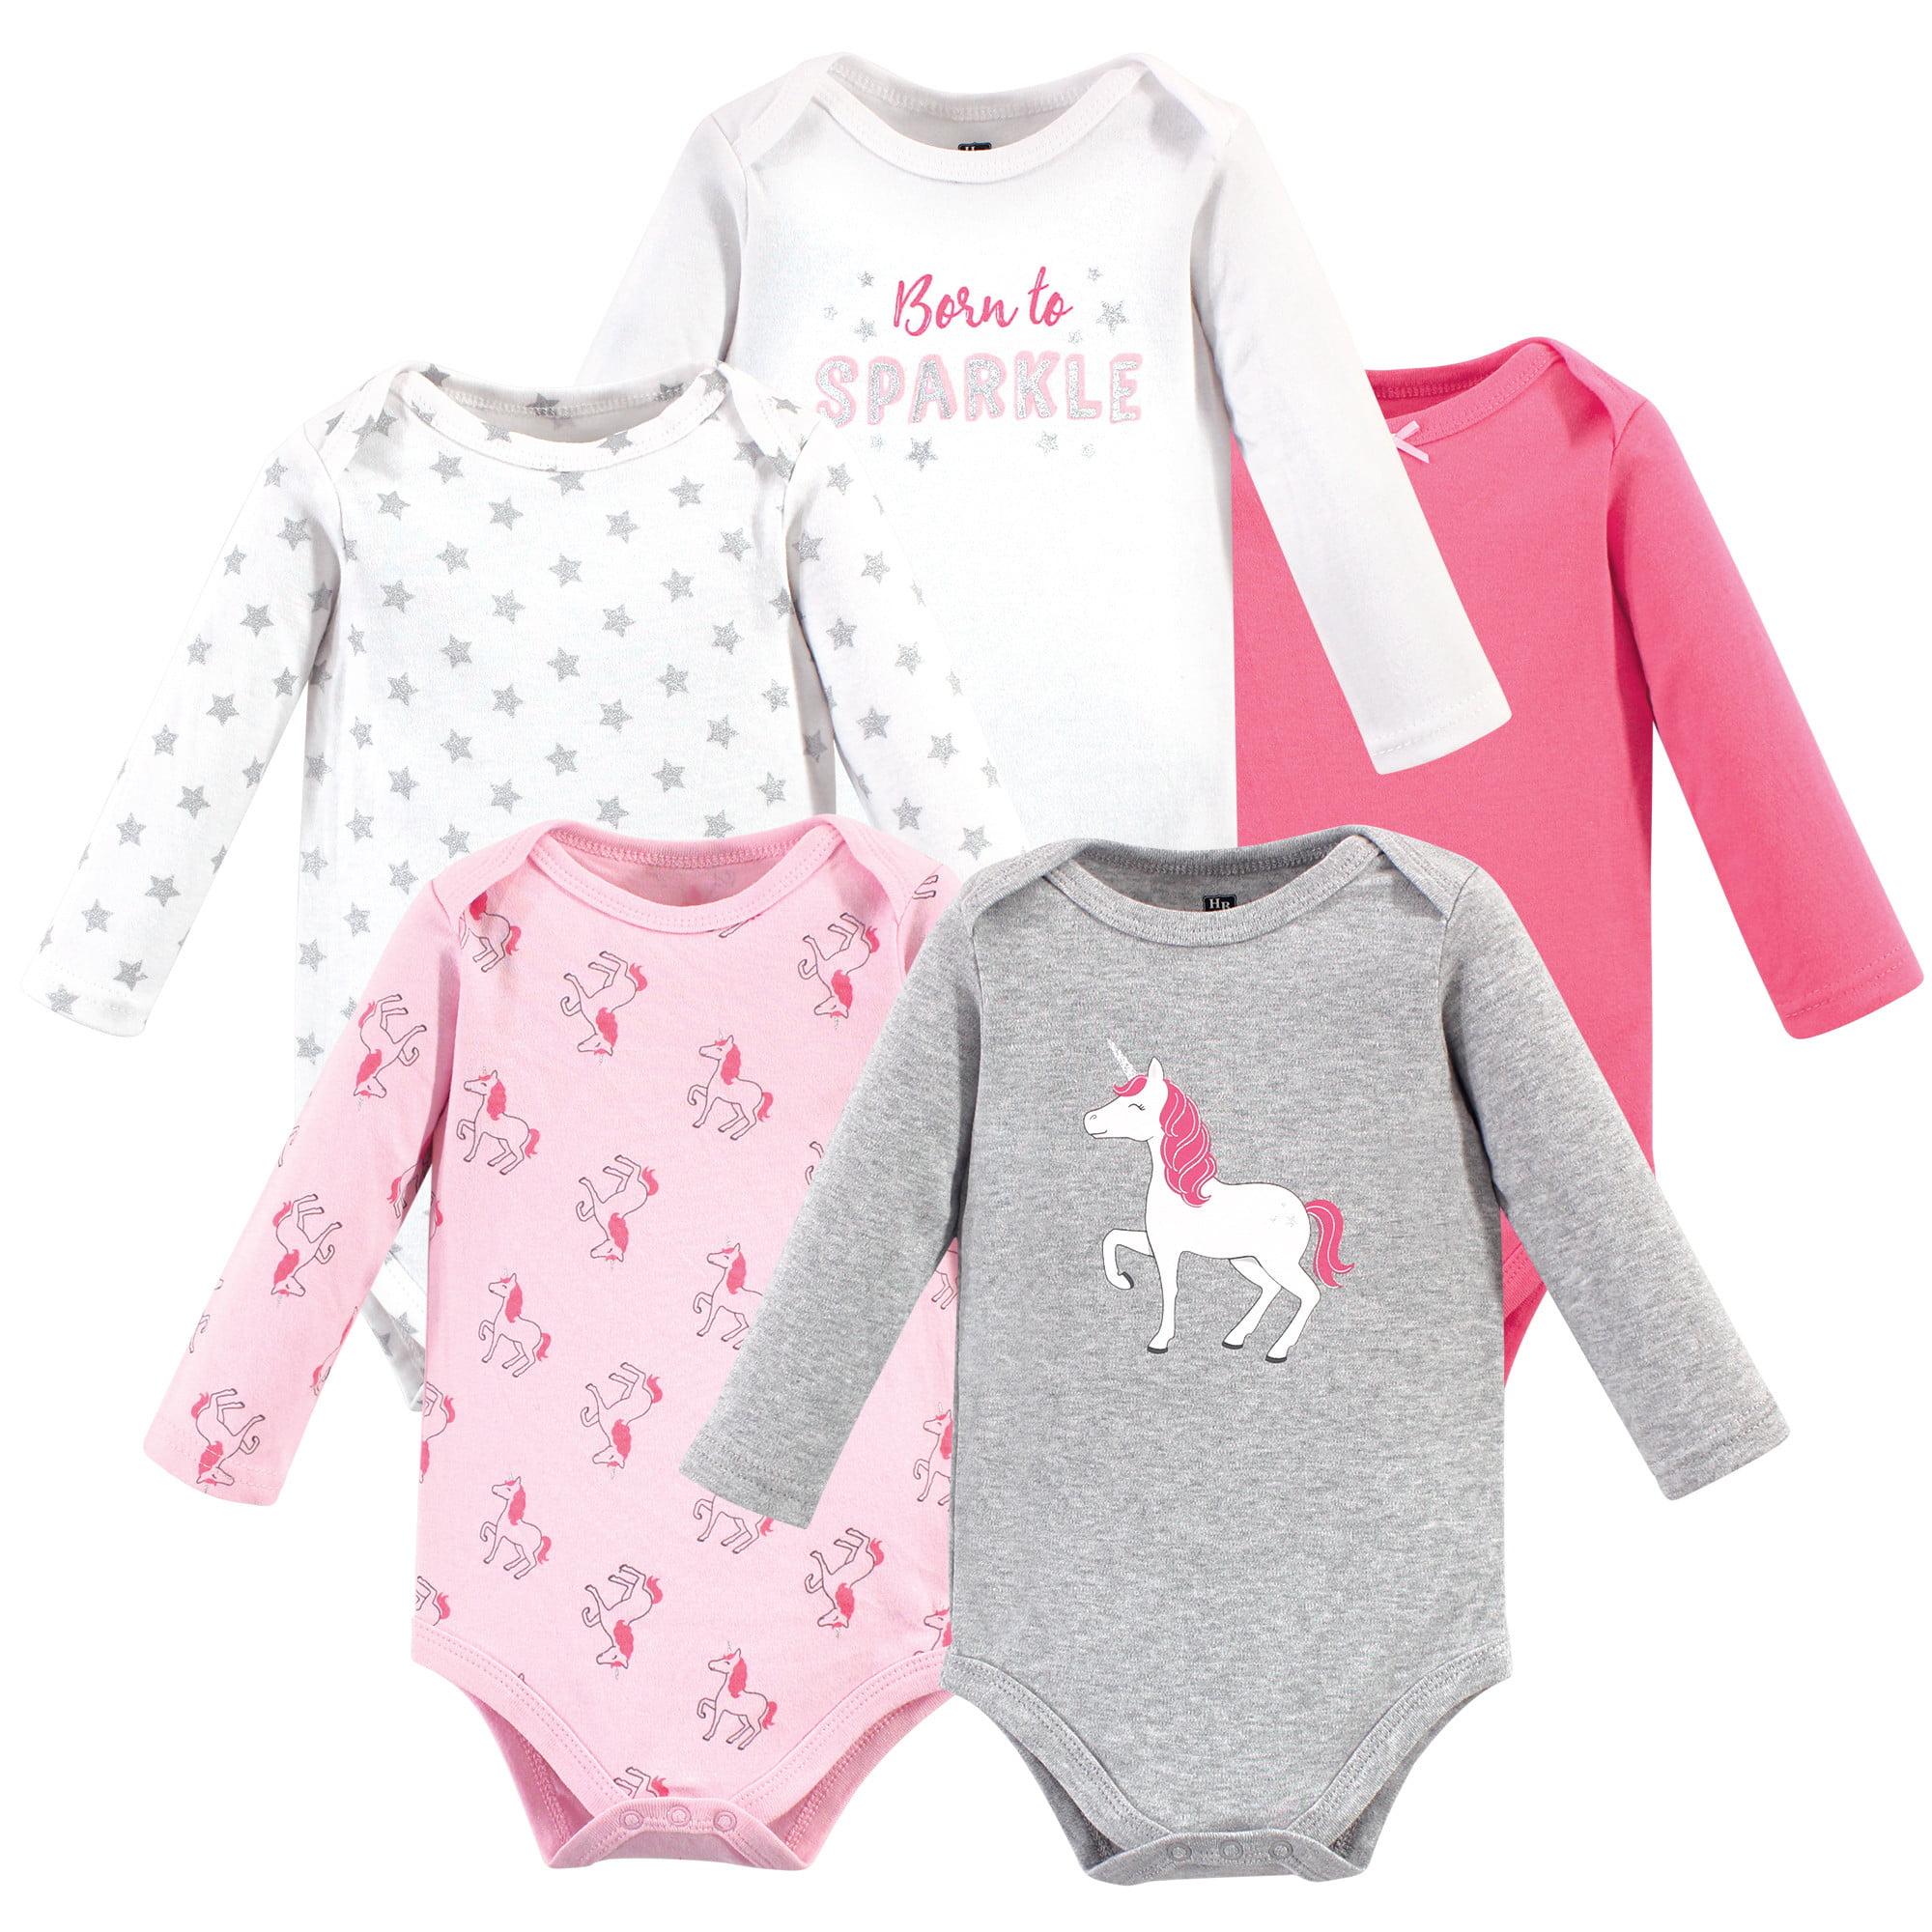 Flamingo and Sloth Baby Boy Long Sleeve Baby Girls Assorted Short Sleeve Bodysuit Onesies